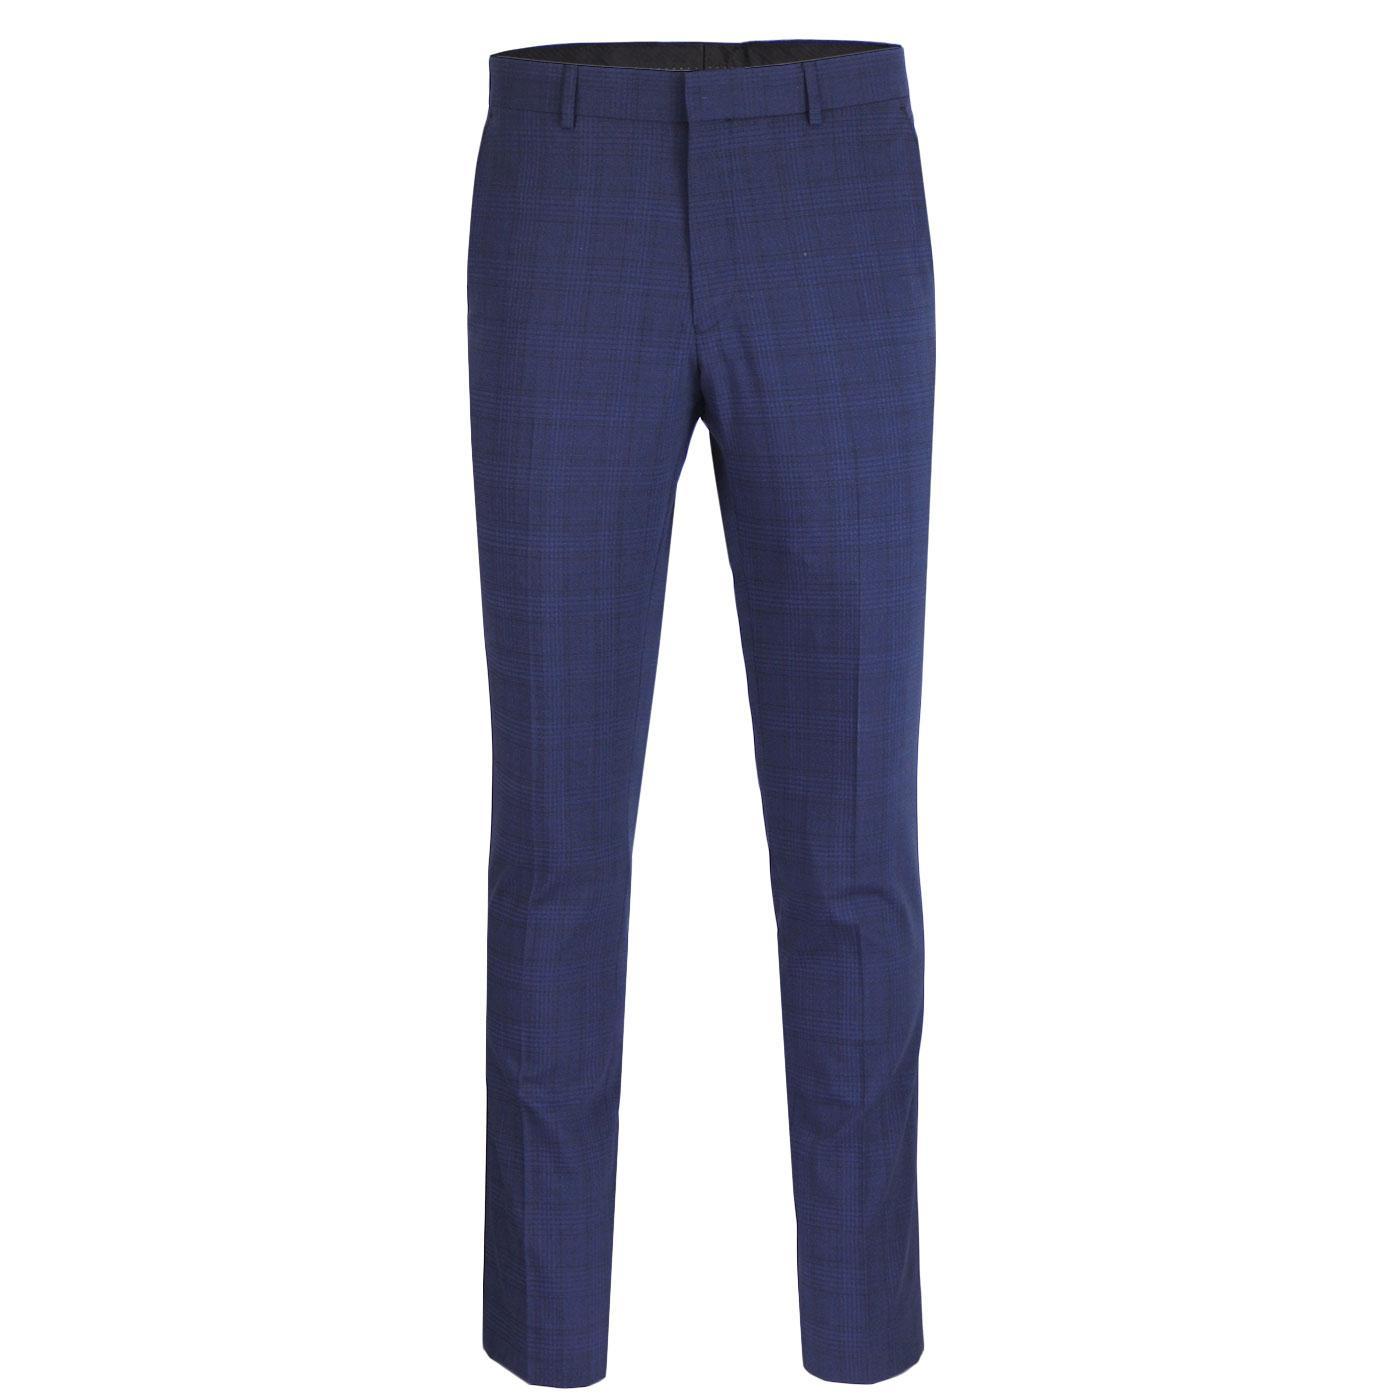 BEN SHERMAN 60s Mod Sapphire check Suit Trousers